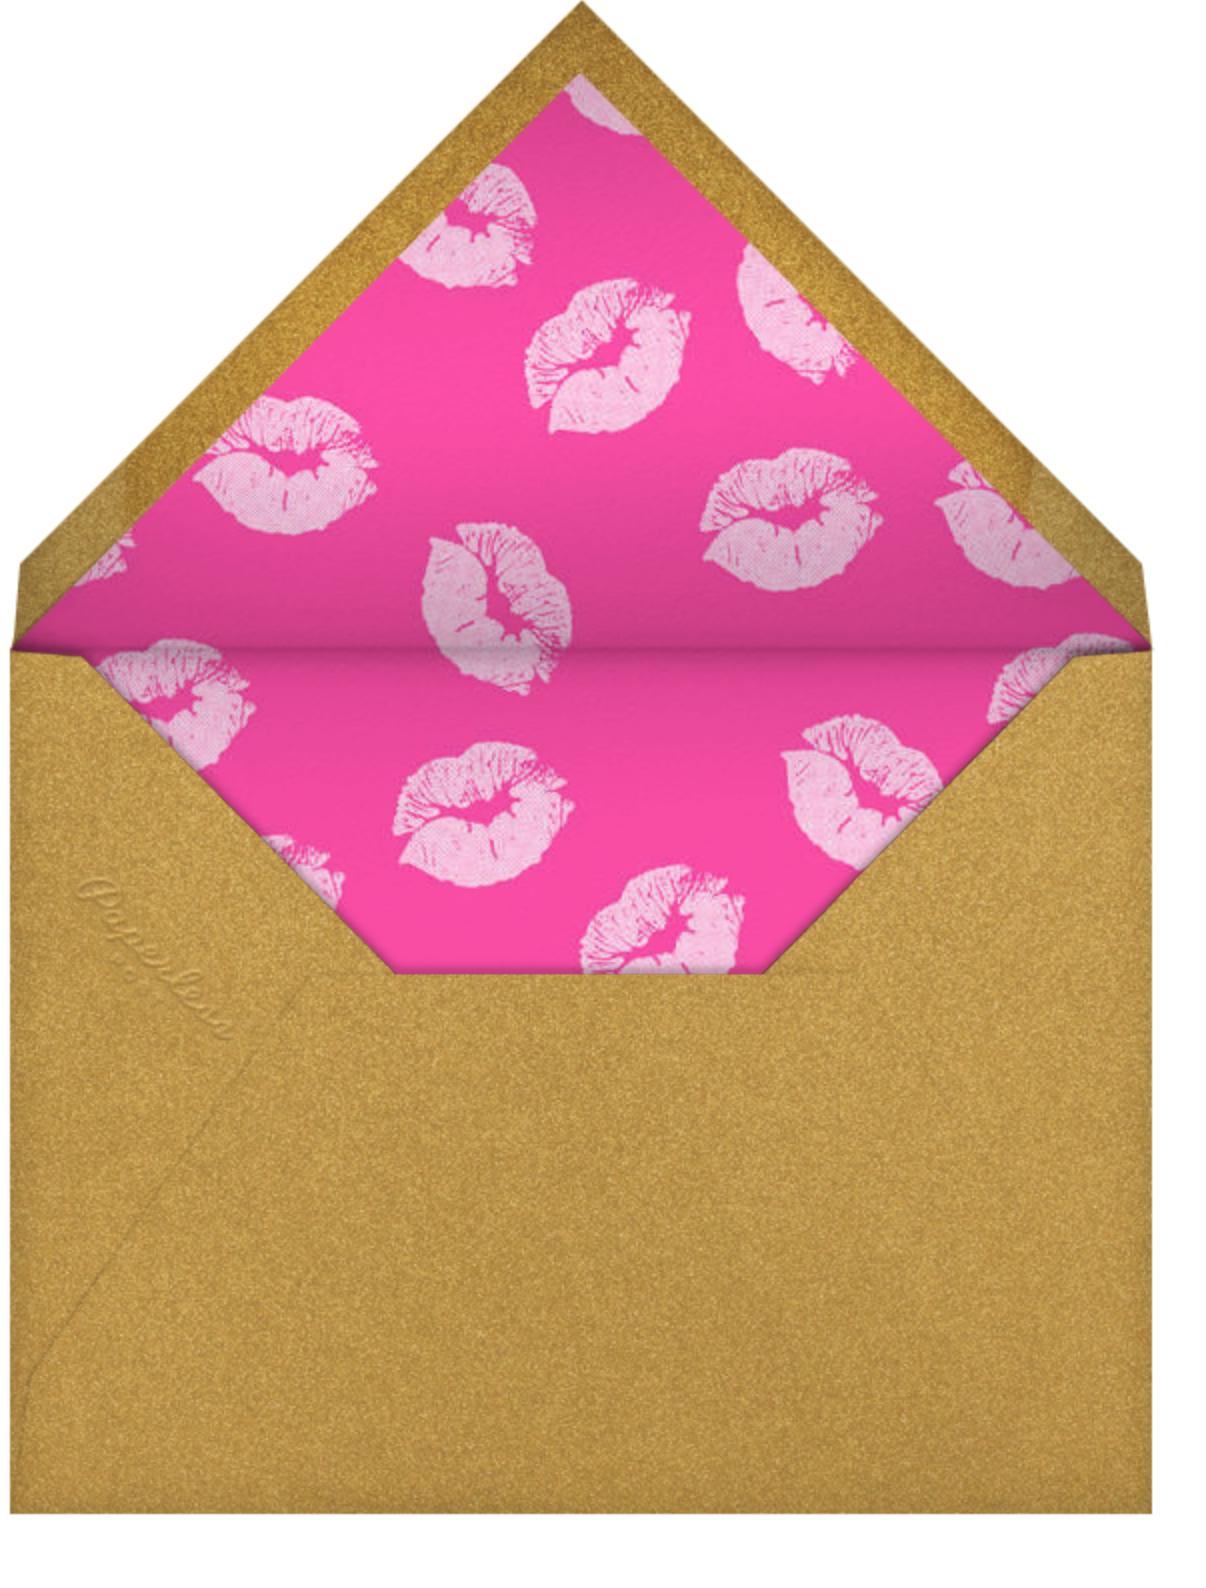 Snapshot - Gold Kiss - Paperless Post - Adult birthday - envelope back